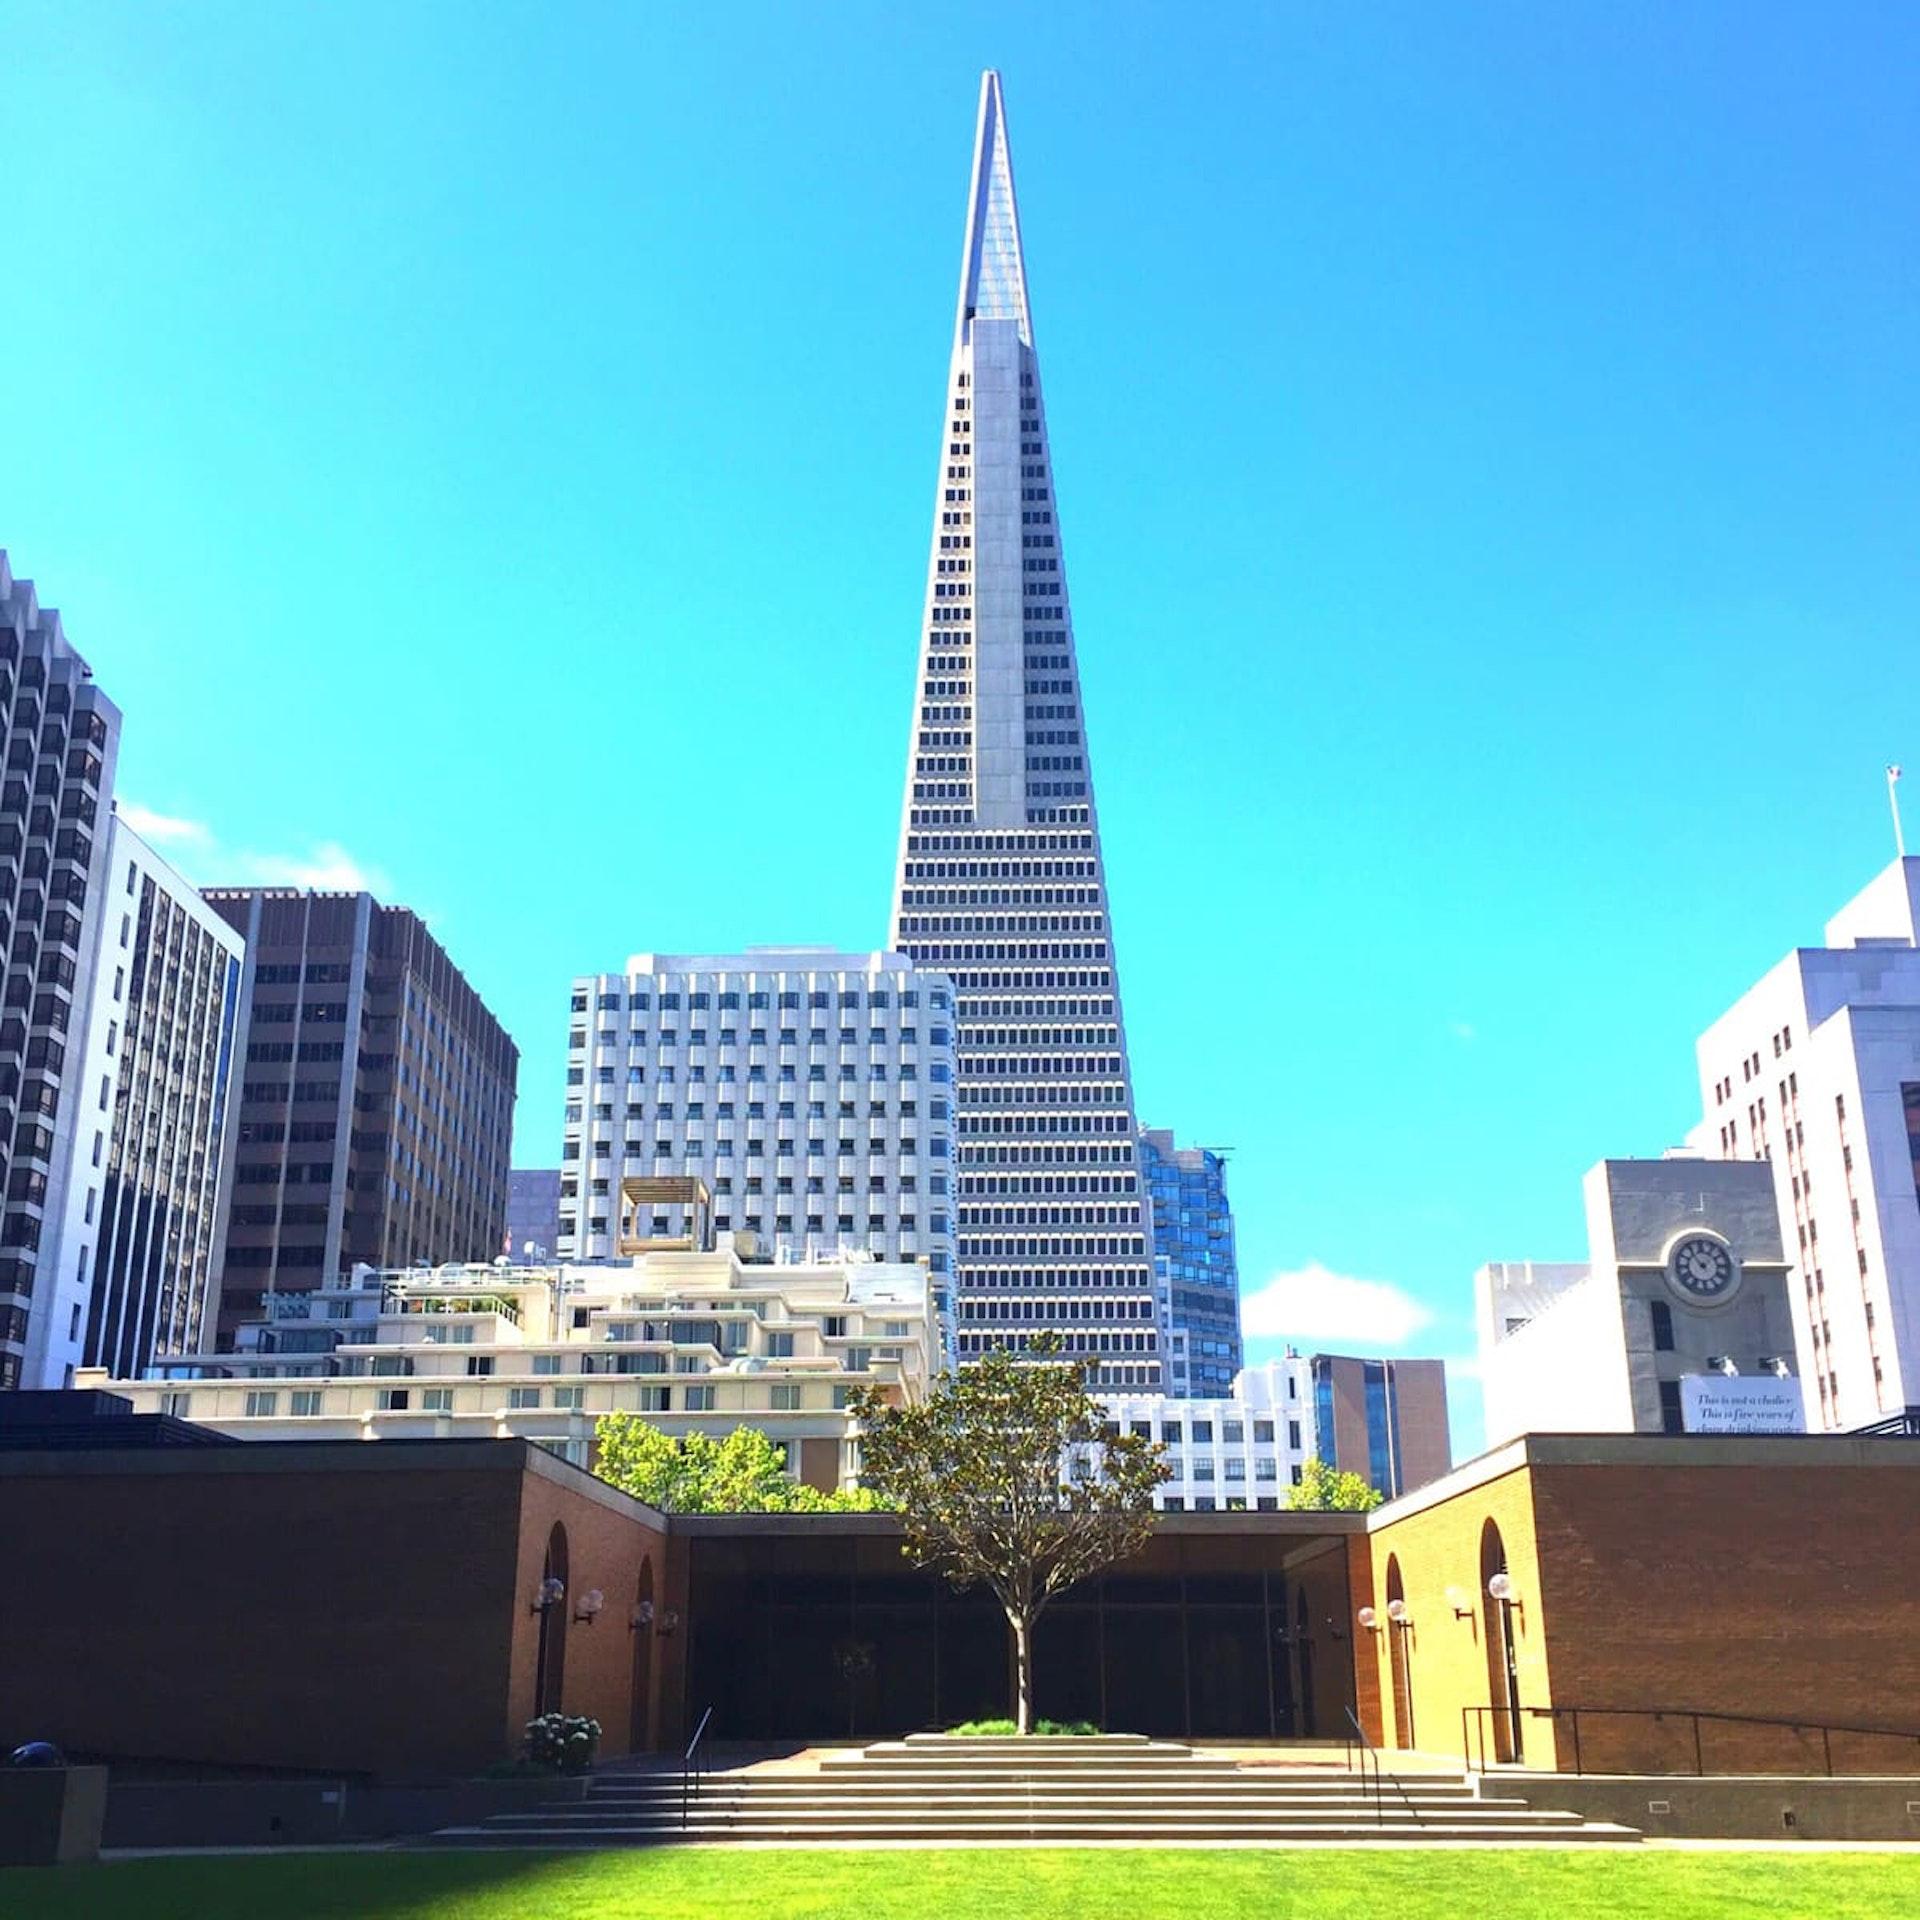 Park in financial district, San Francisco